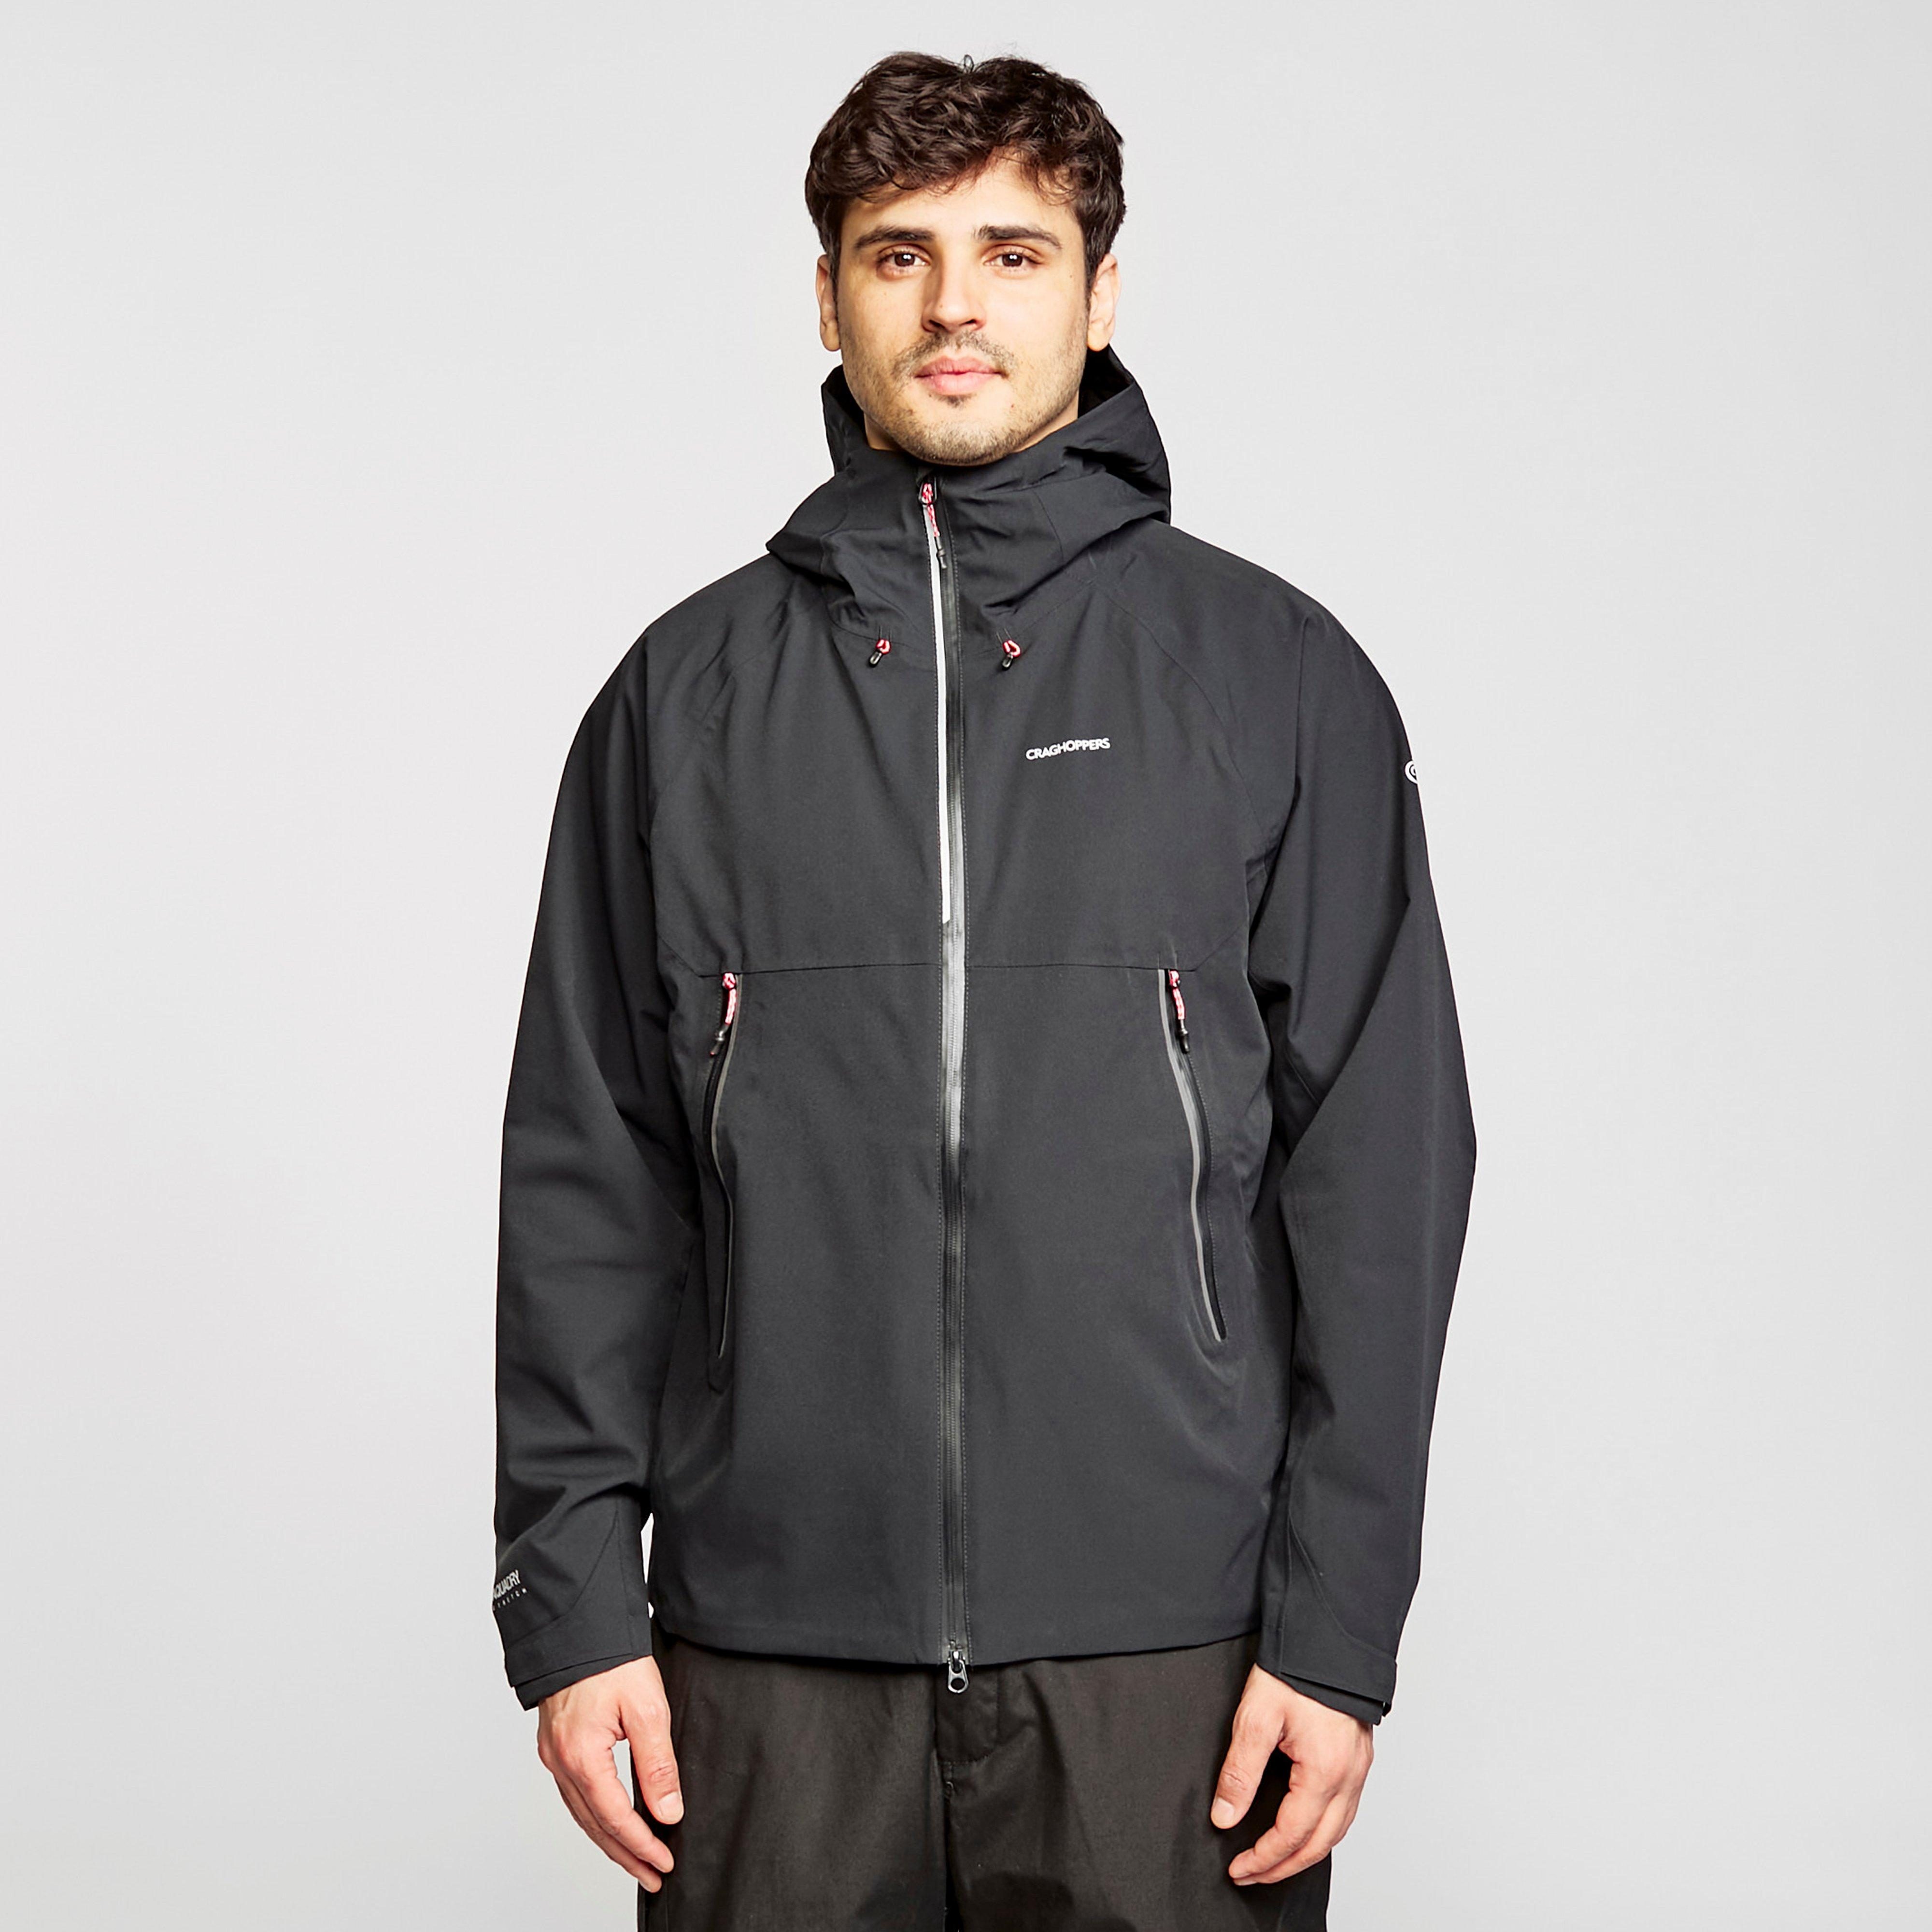 Craghoppers Men's Trelawney Jacket - Black, Black